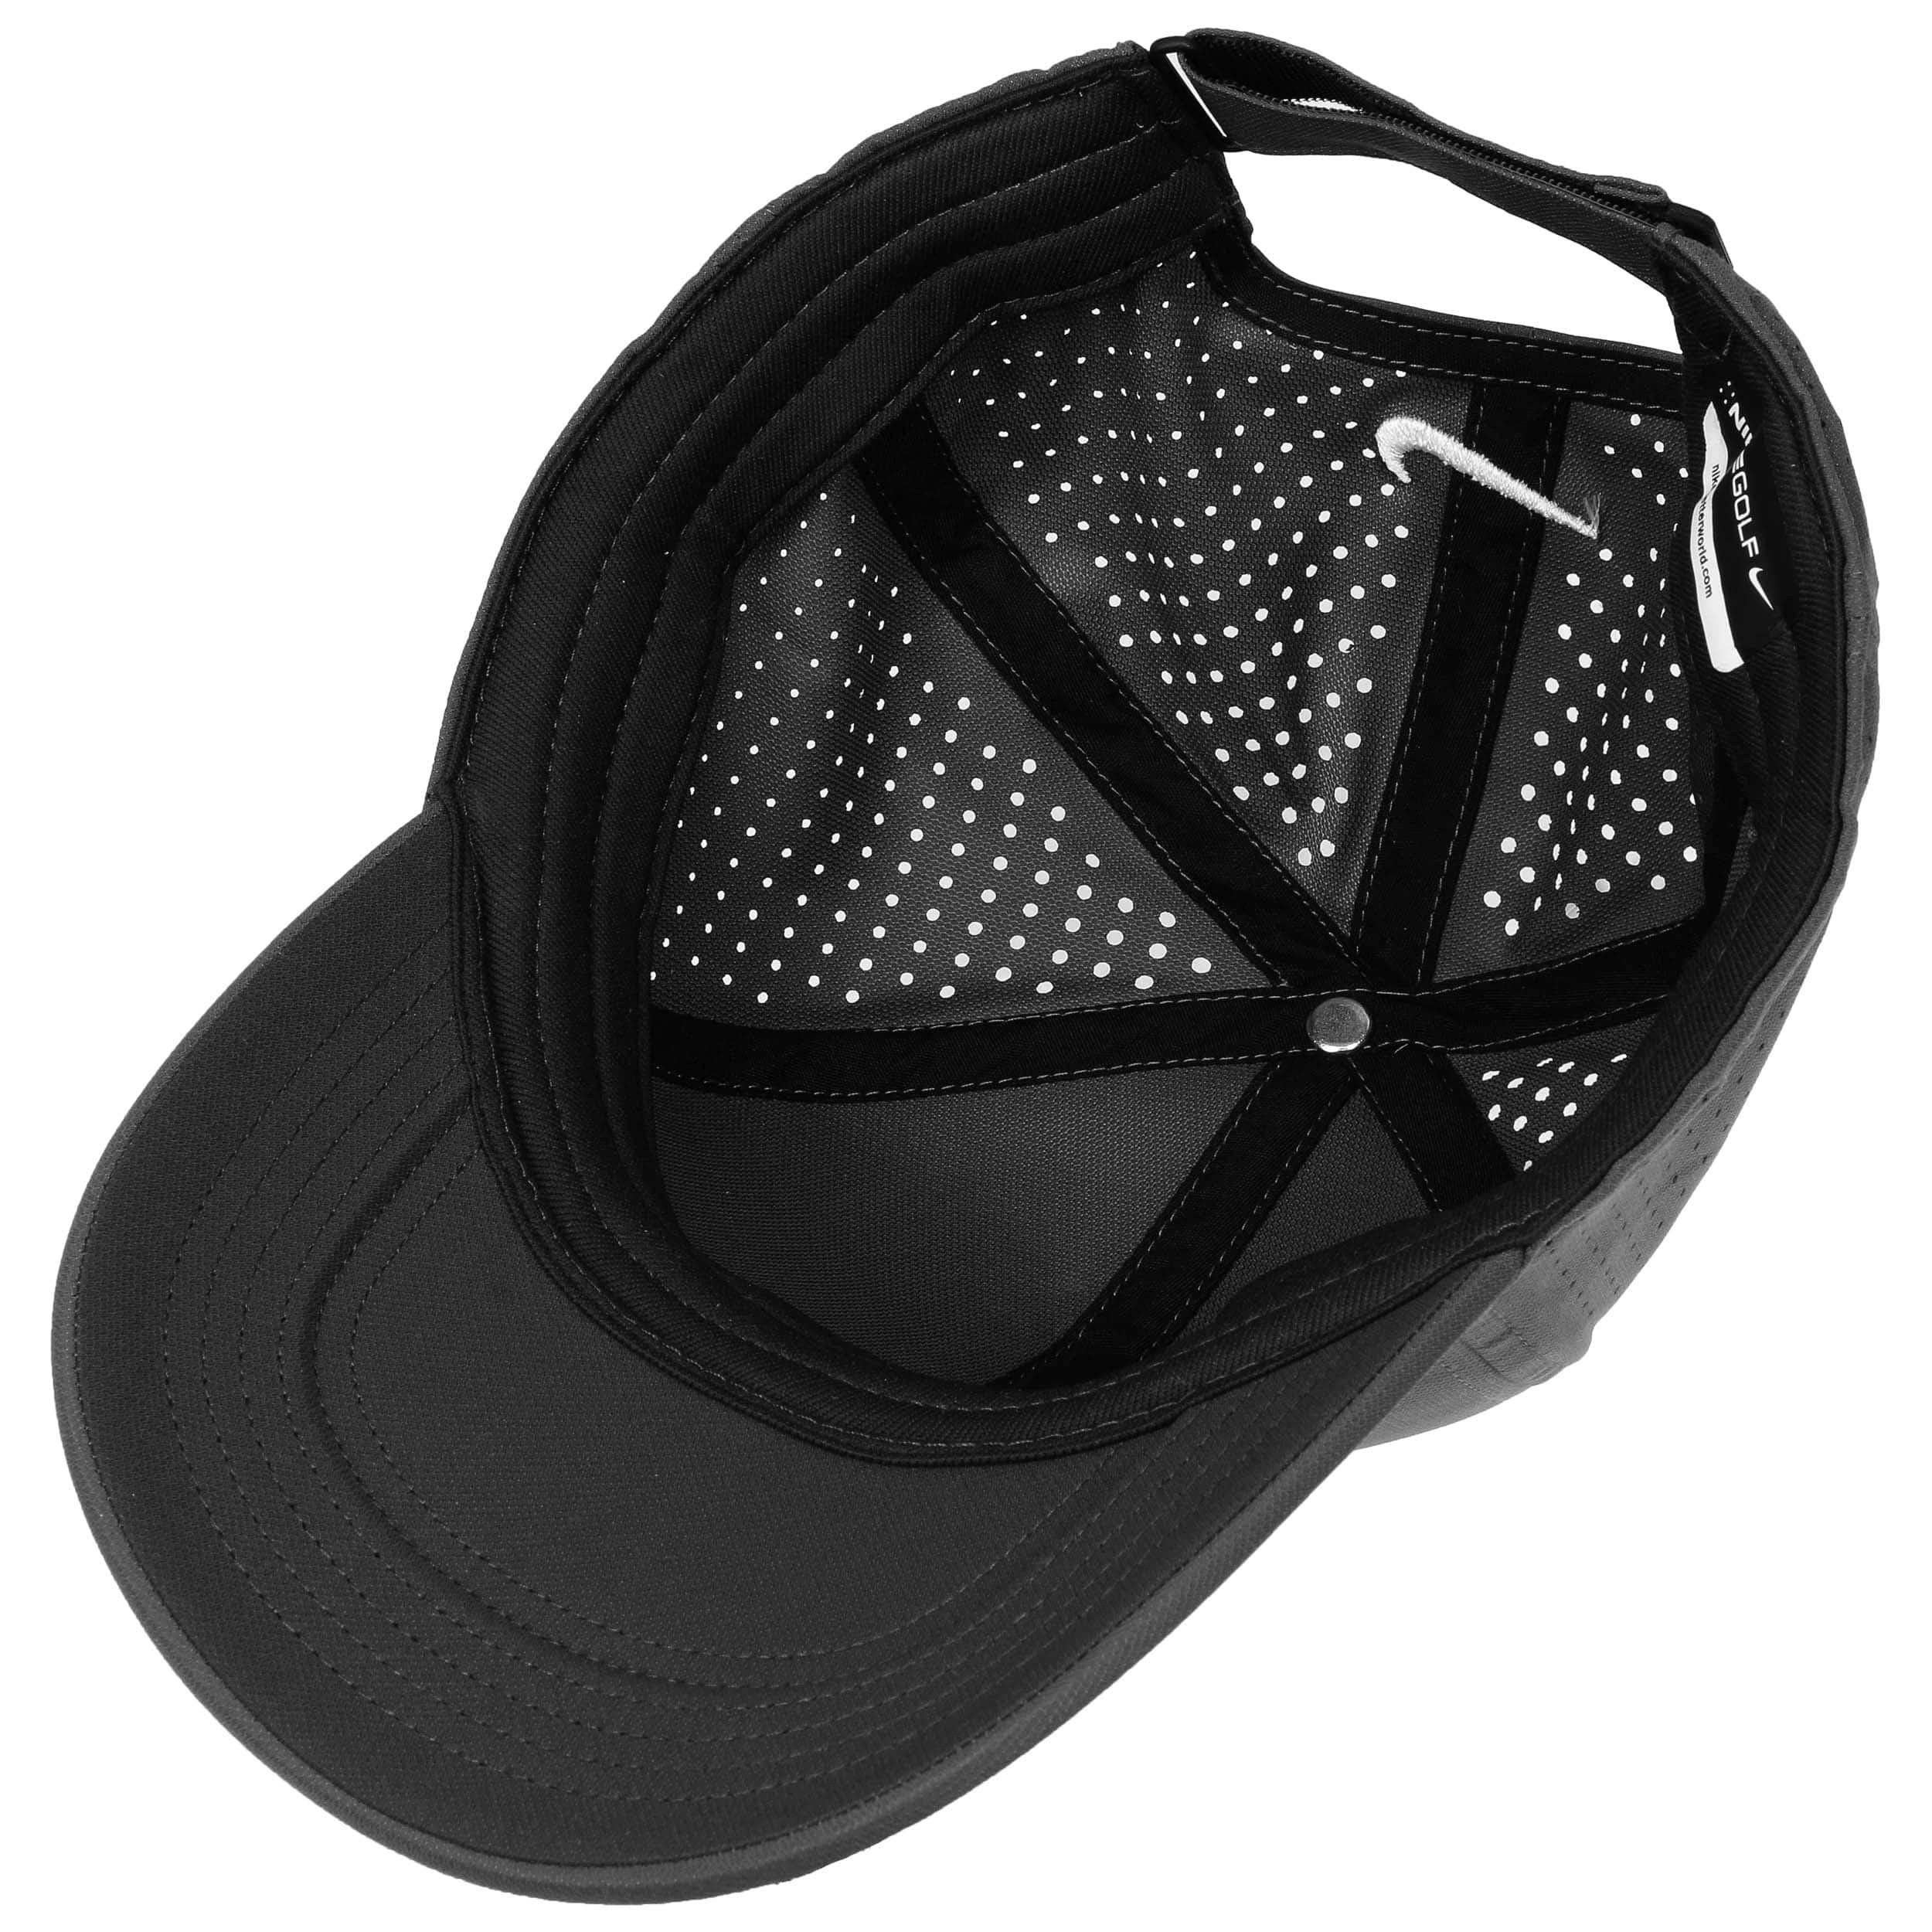 33e837f767e ... coupon code legacy 91 perf strapback cap by nike black 2 da802 74038